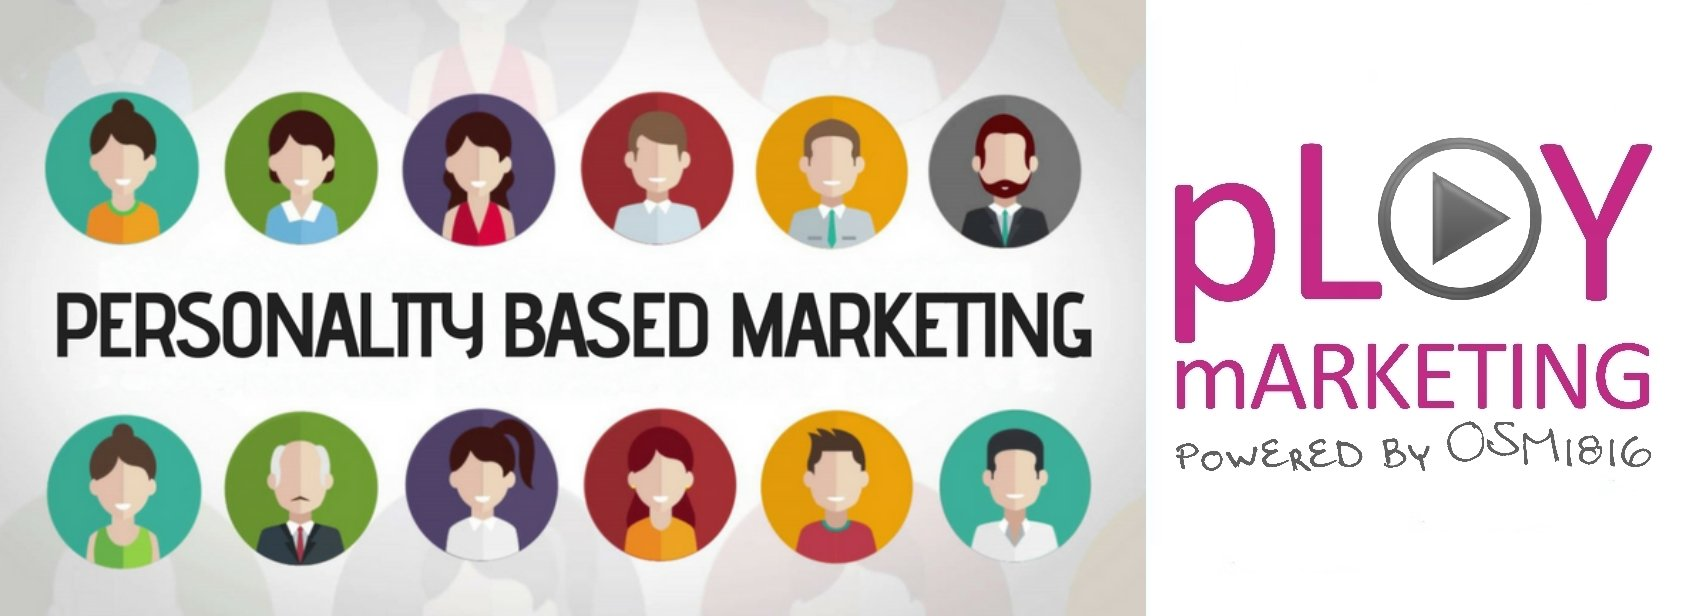 Personality based marketing